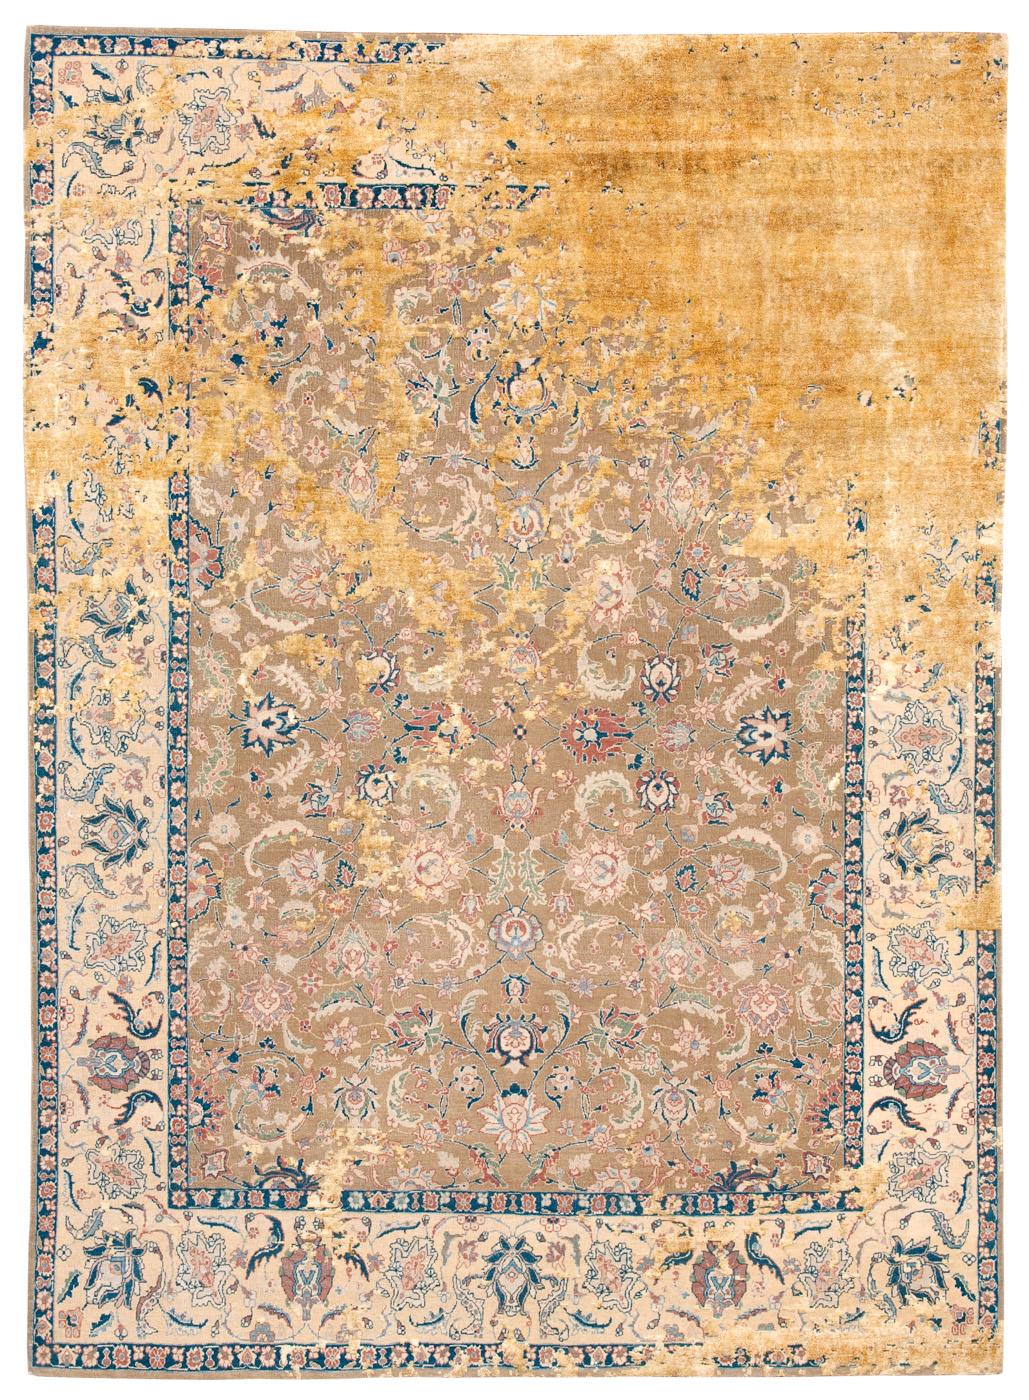 Erased-Heritage-carpet-Kyle-and-Kath-wallpaper-wp425249-1